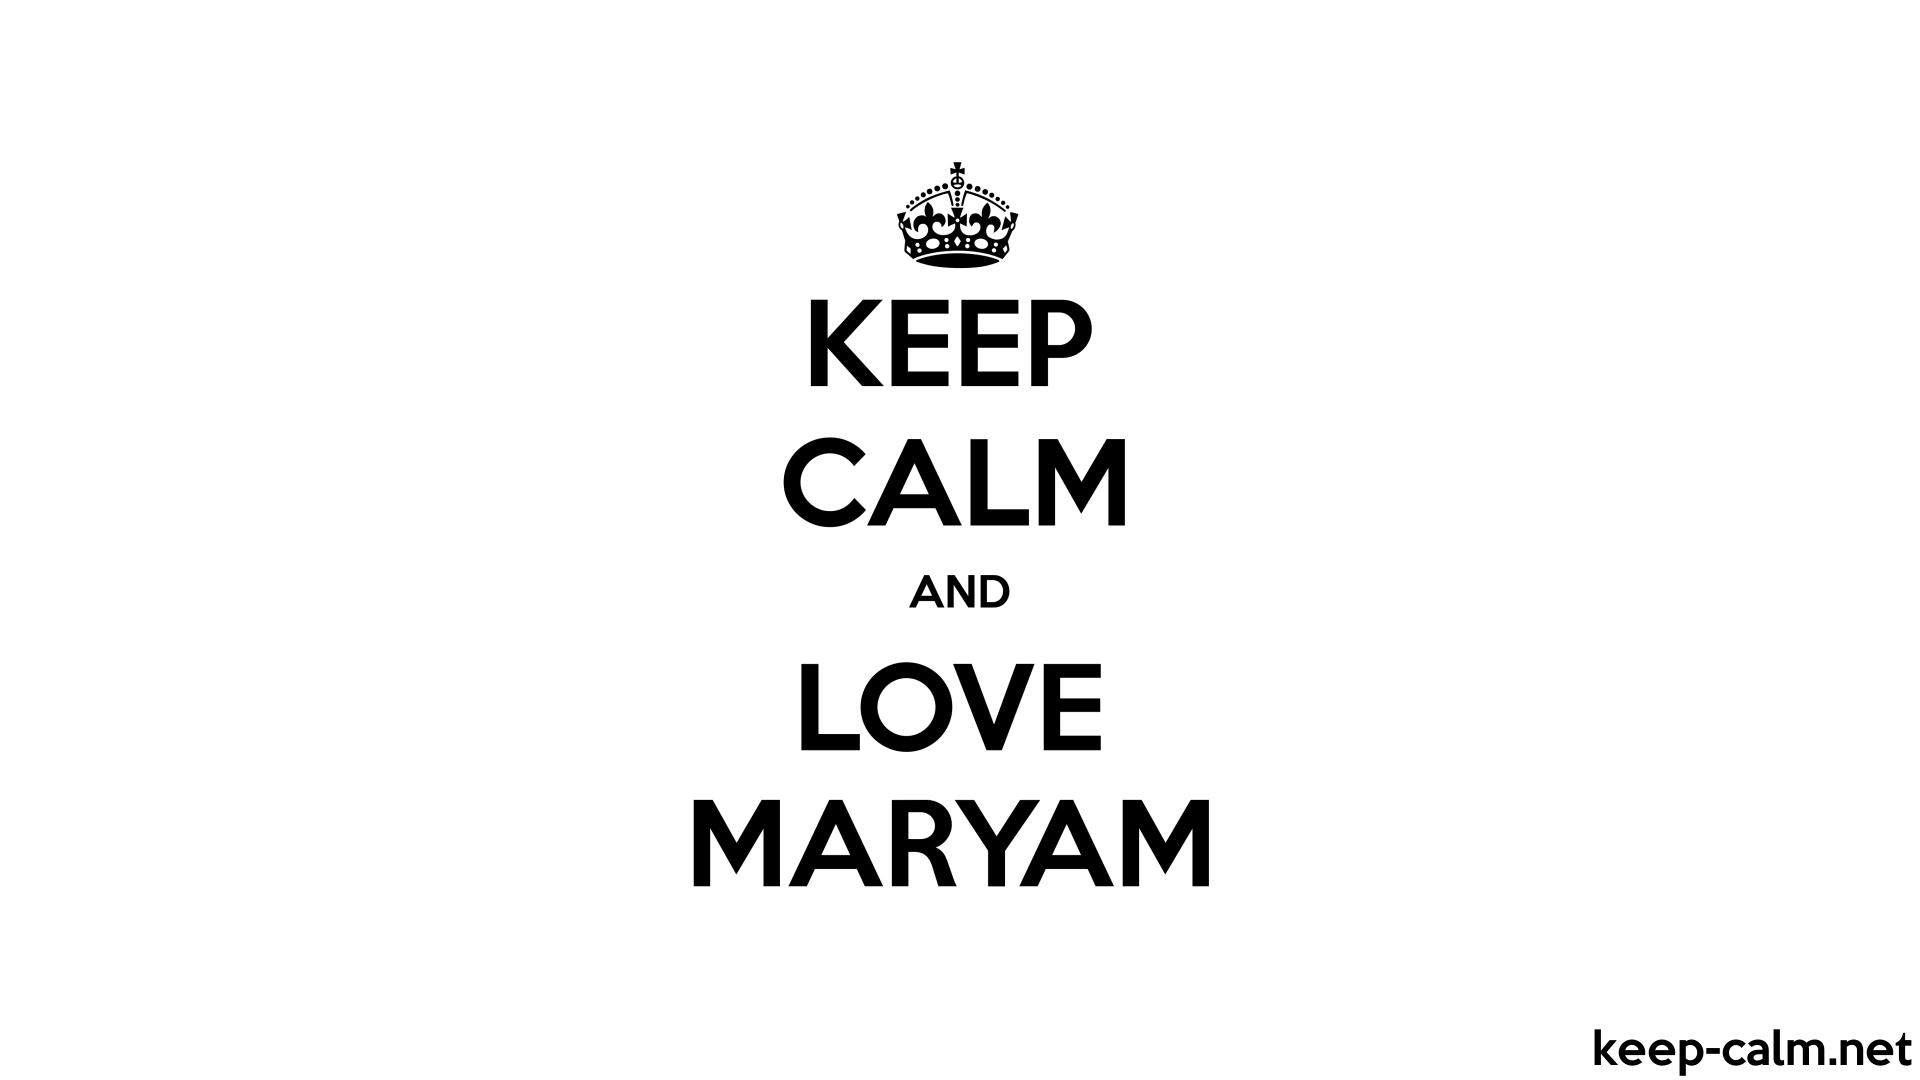 Good Wallpaper Name Maryam - keep-calm-and-love-maryam-1920-1080-black-white  2018_75633.jpg